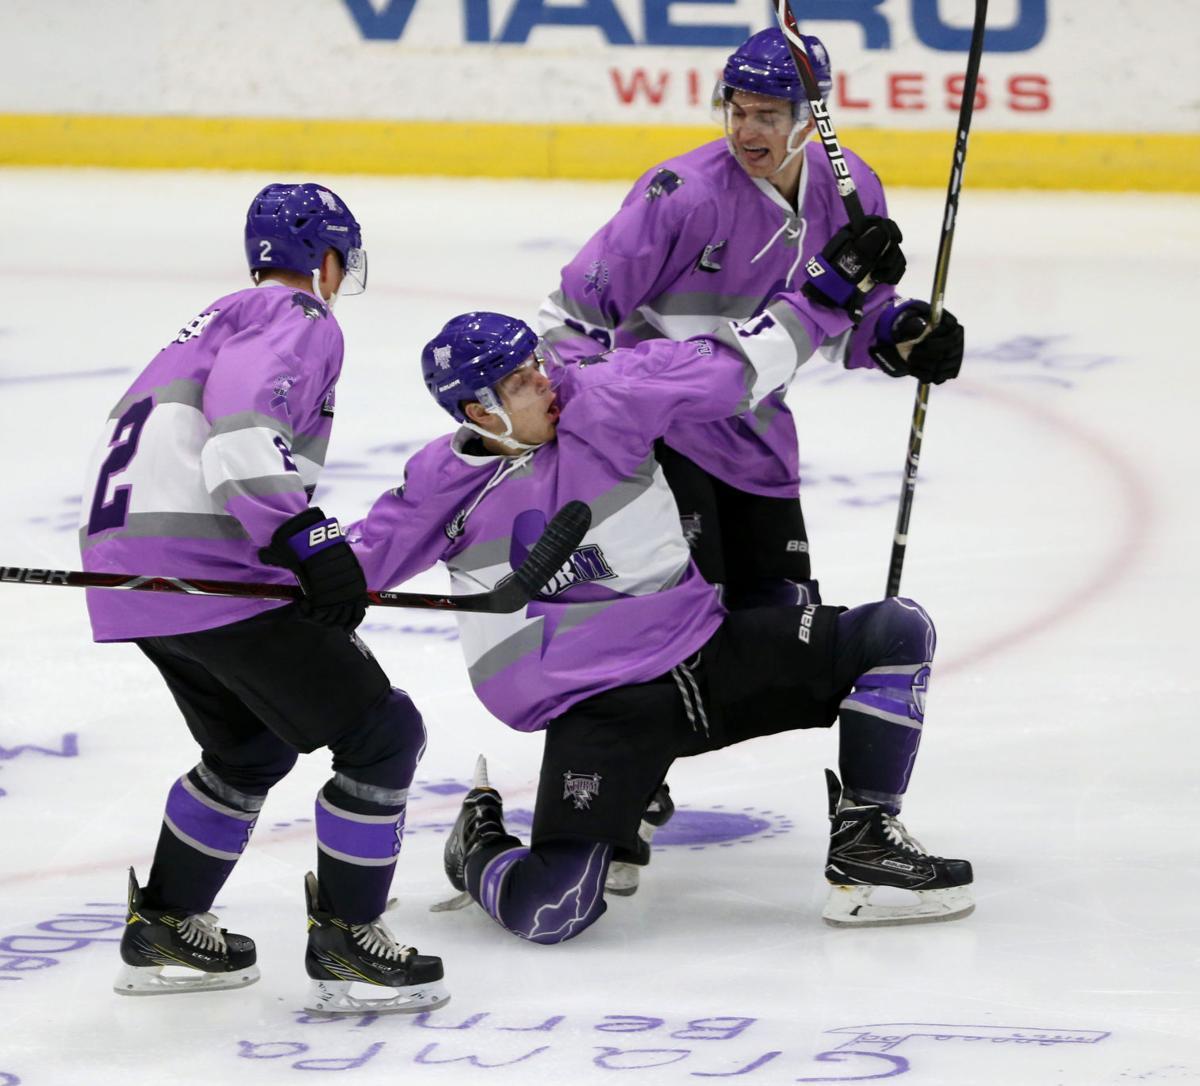 10-16-18 Storm Hockey gallery01 Chase McLane.jpg